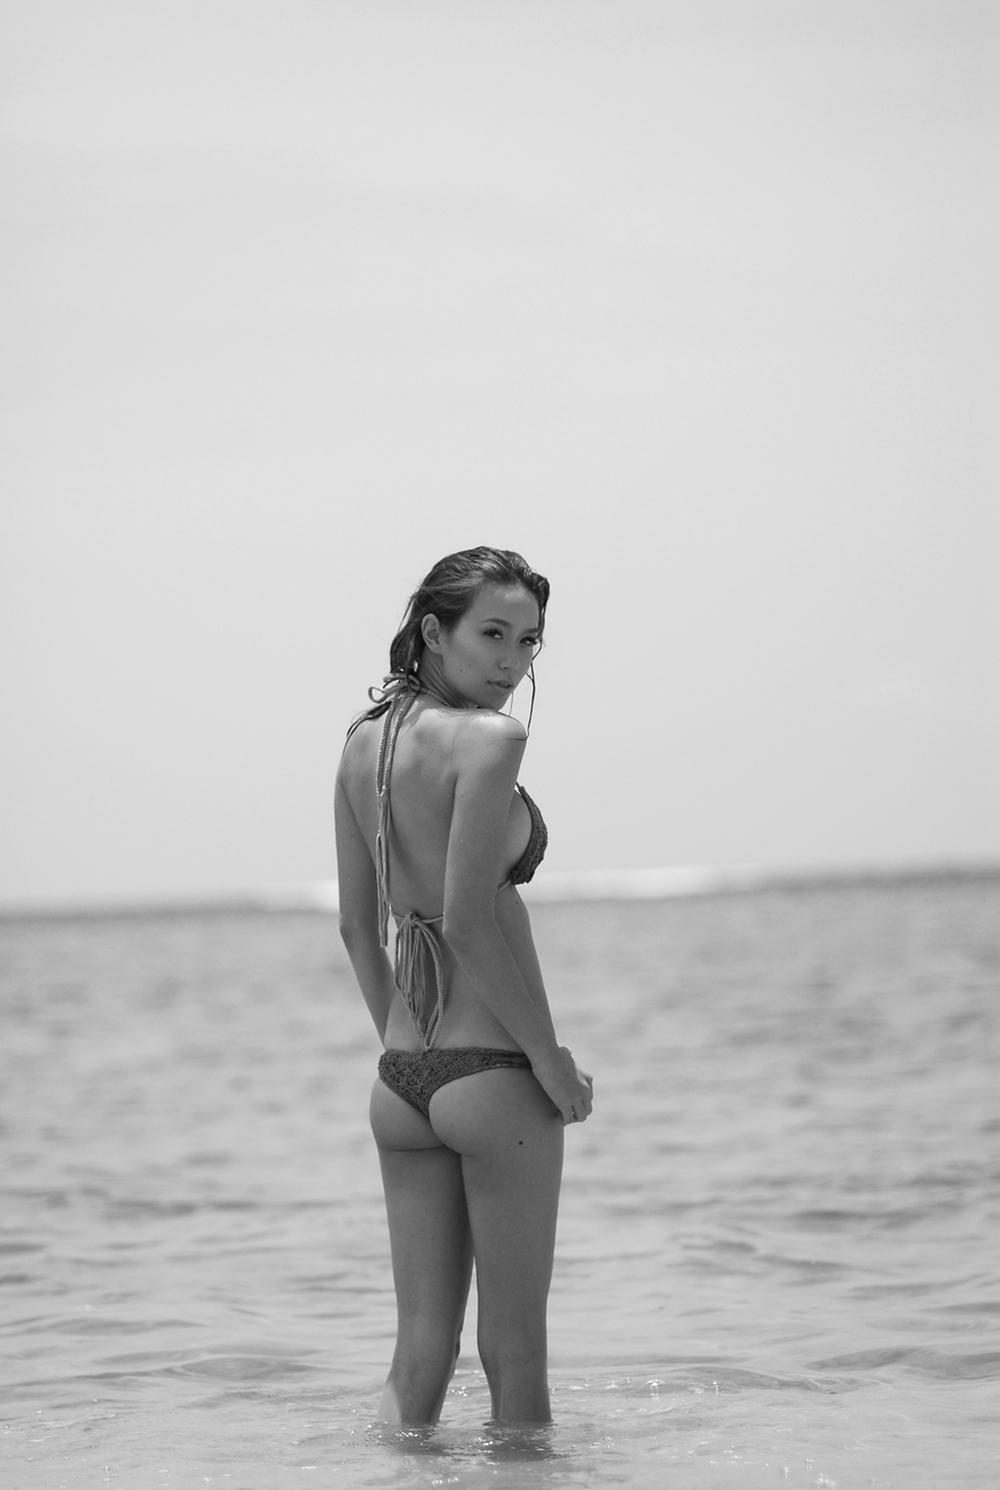 Swimbook_swimsuit_Rove_Jollie_Reve_Bohemia_Marlie_Hinshaw_DSC_0771.jpg